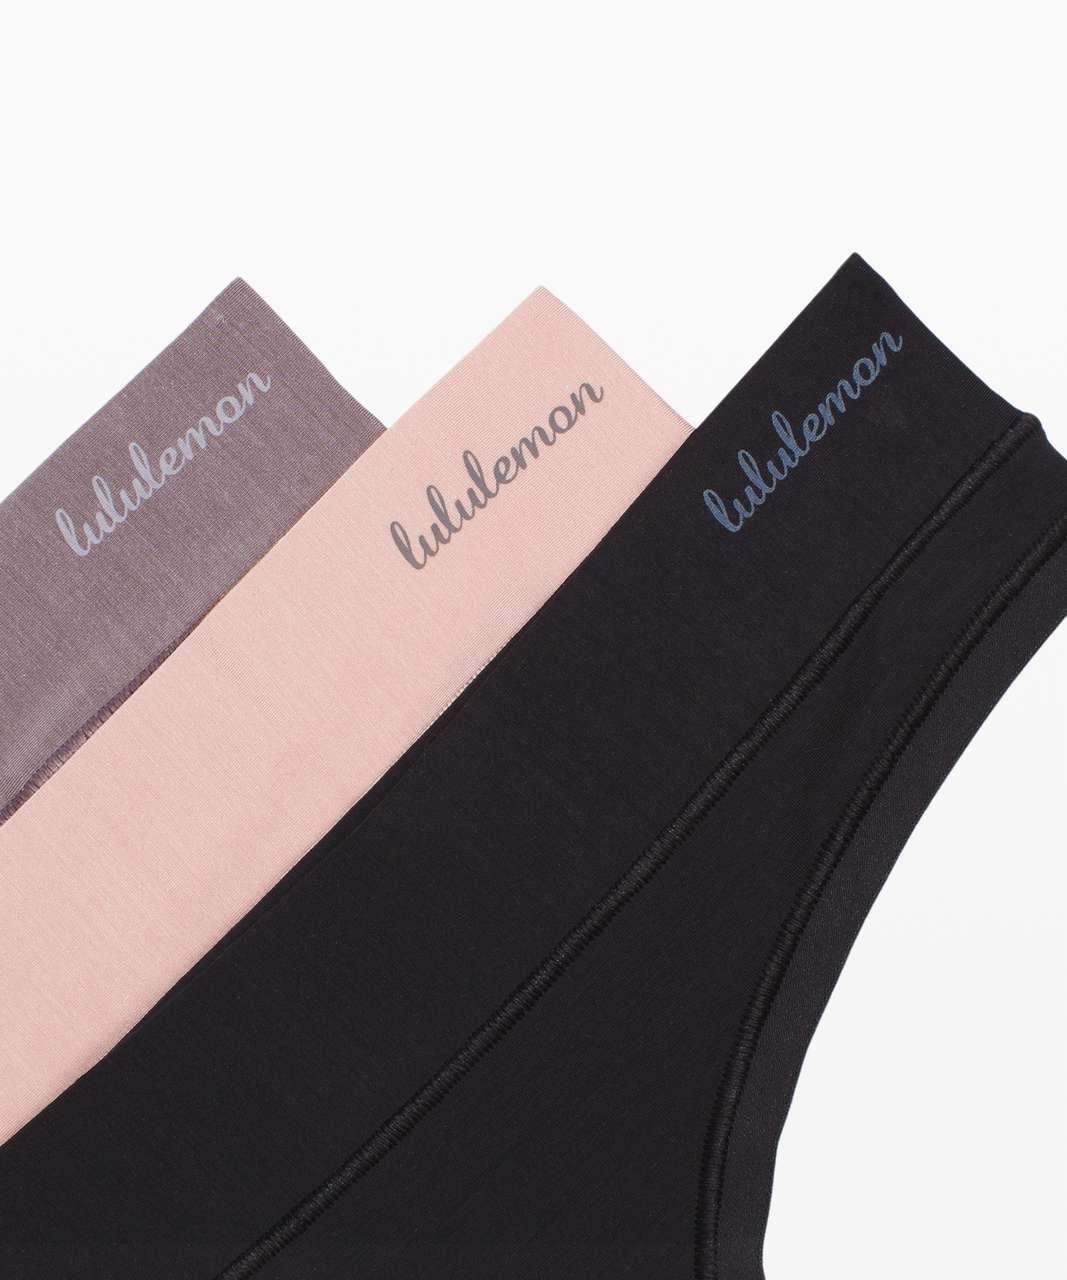 Lululemon Mula Bandhawear Thong *3 Pack - Black / Misty Shell / Lunar Rock